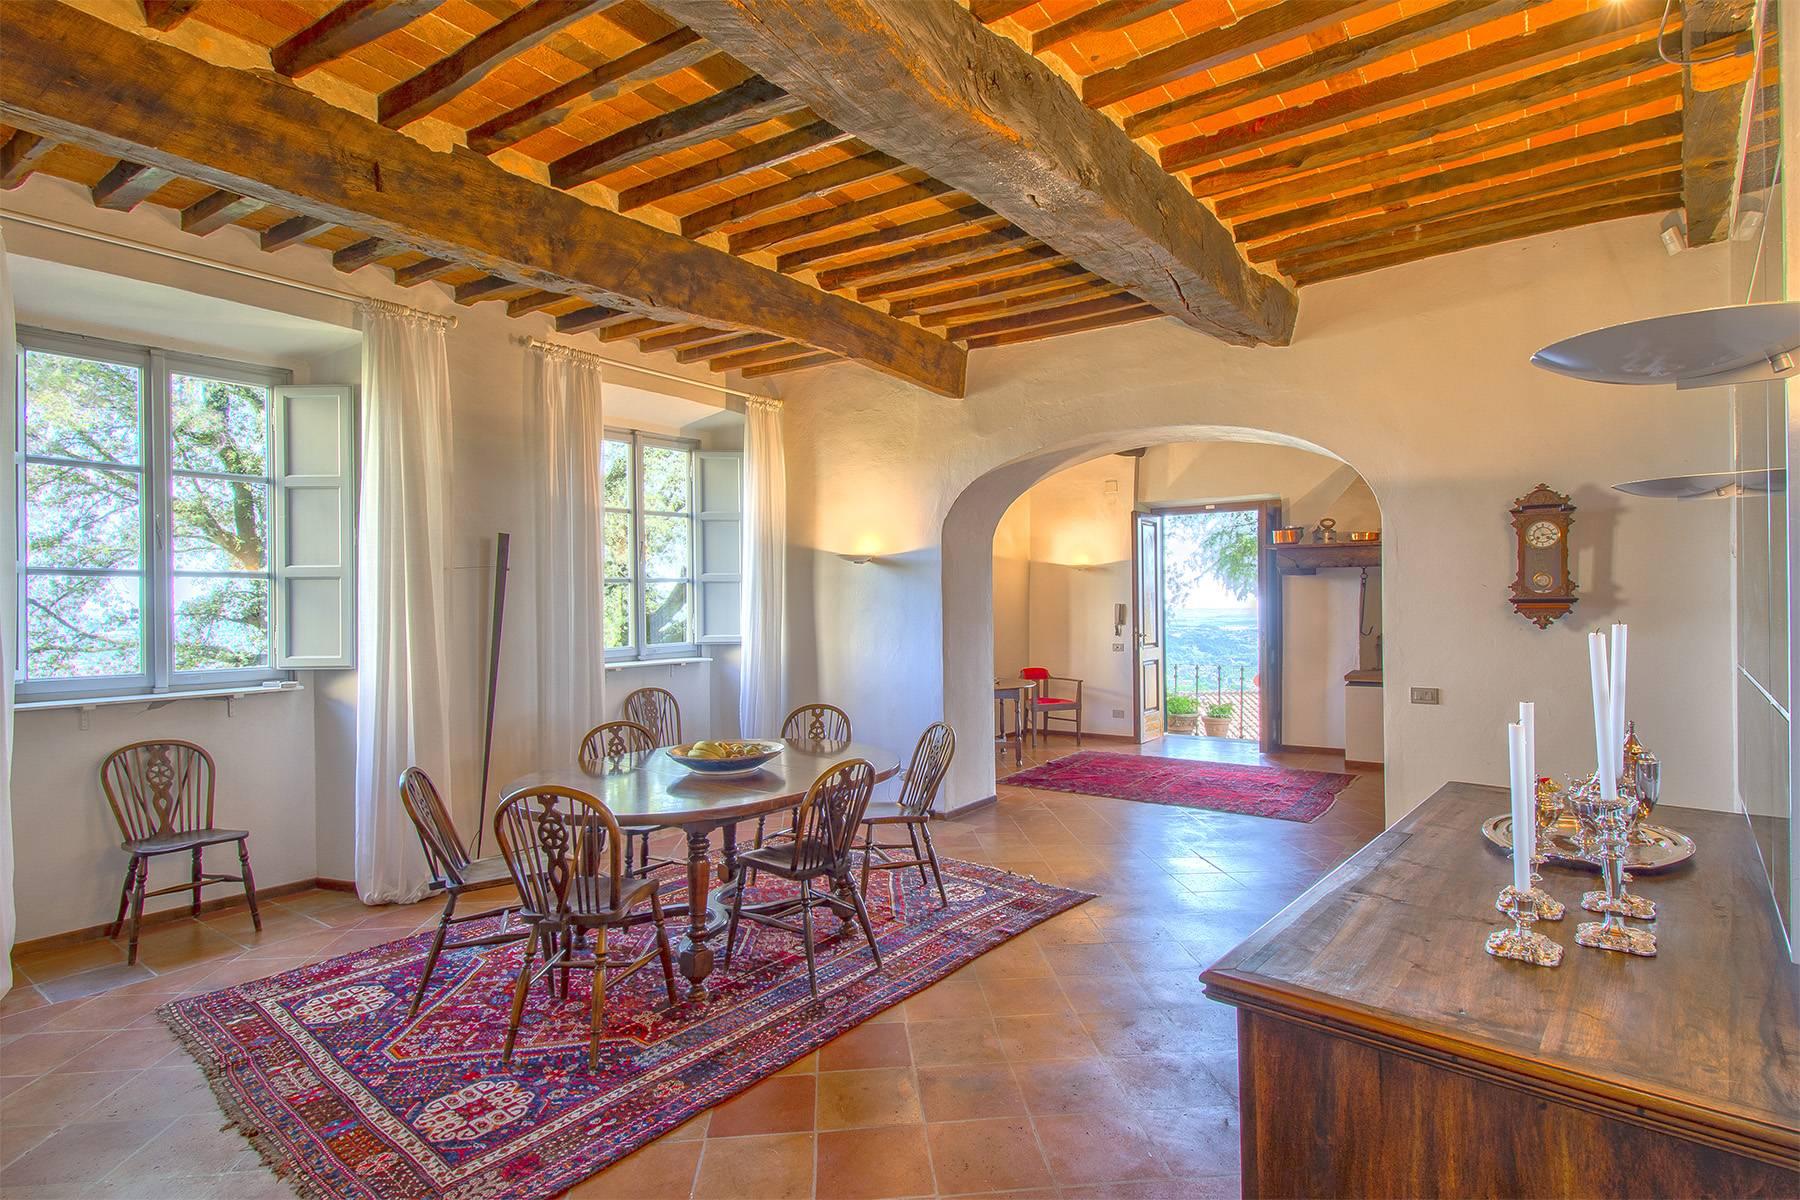 Villa in Vendita a Capannori: 5 locali, 380 mq - Foto 12